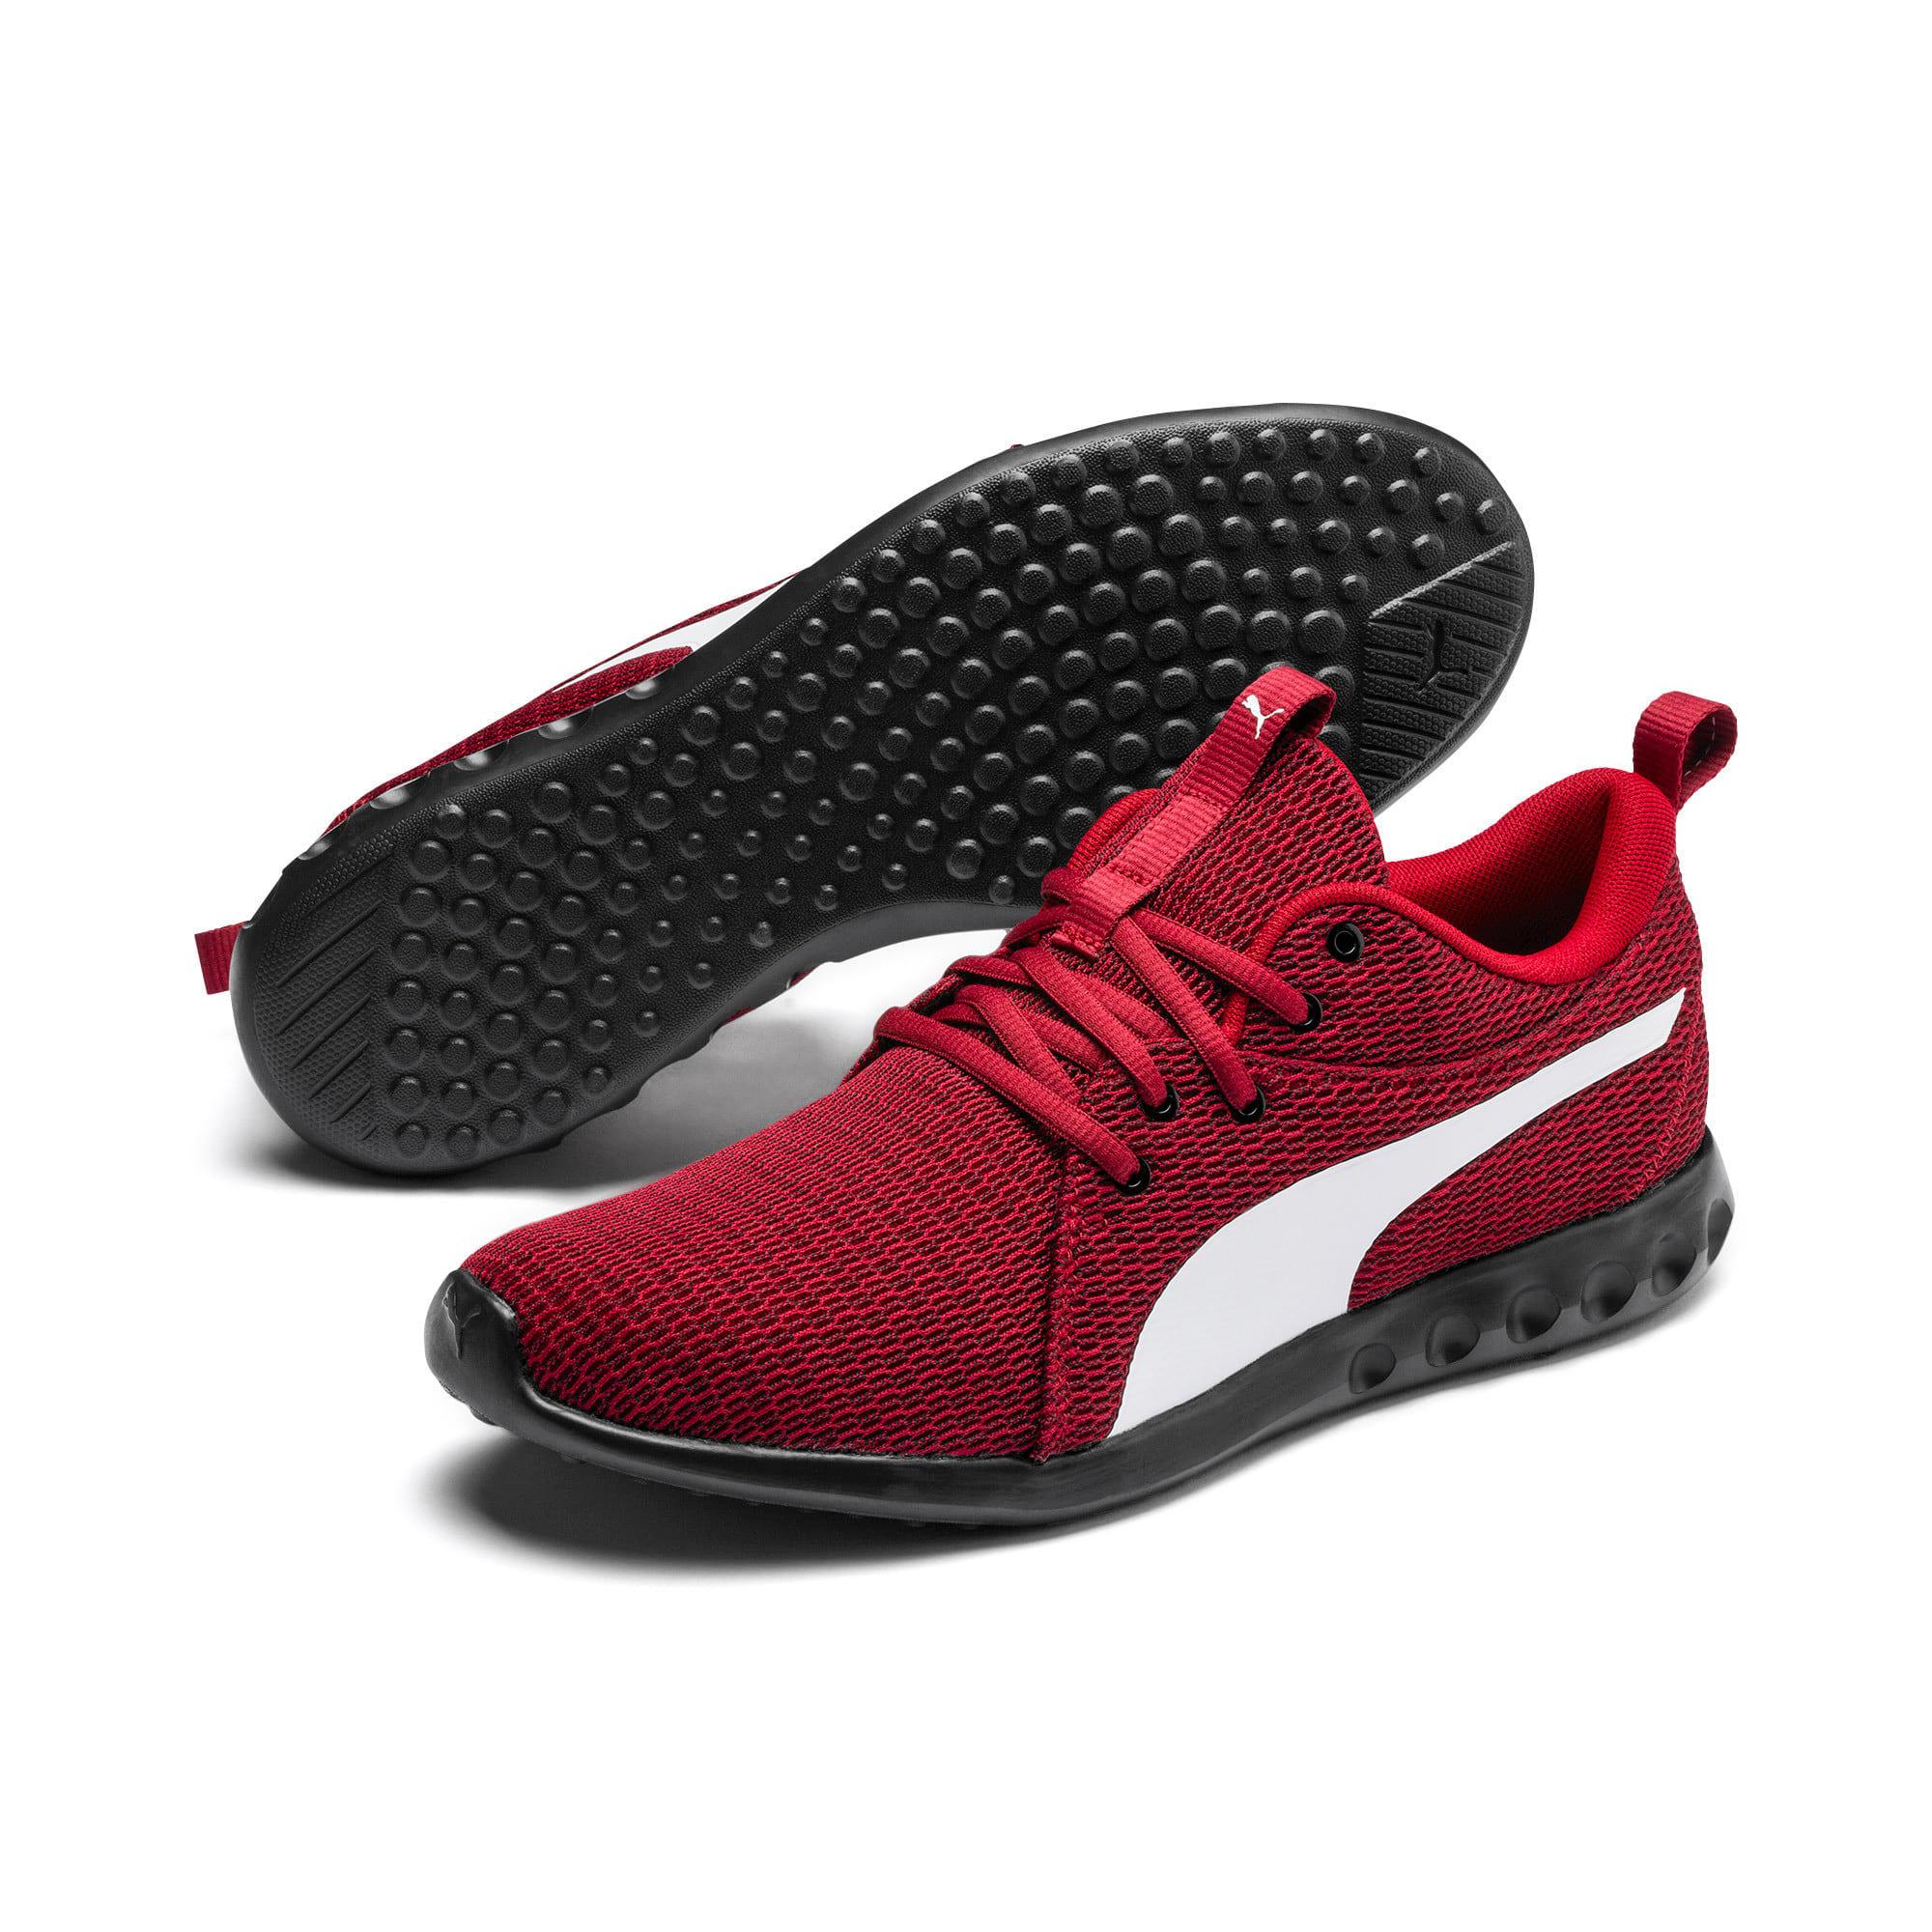 Thumbnail 2 of Carson 2 New Core Men's Running Shoes, Rhubarb-White-Black, medium